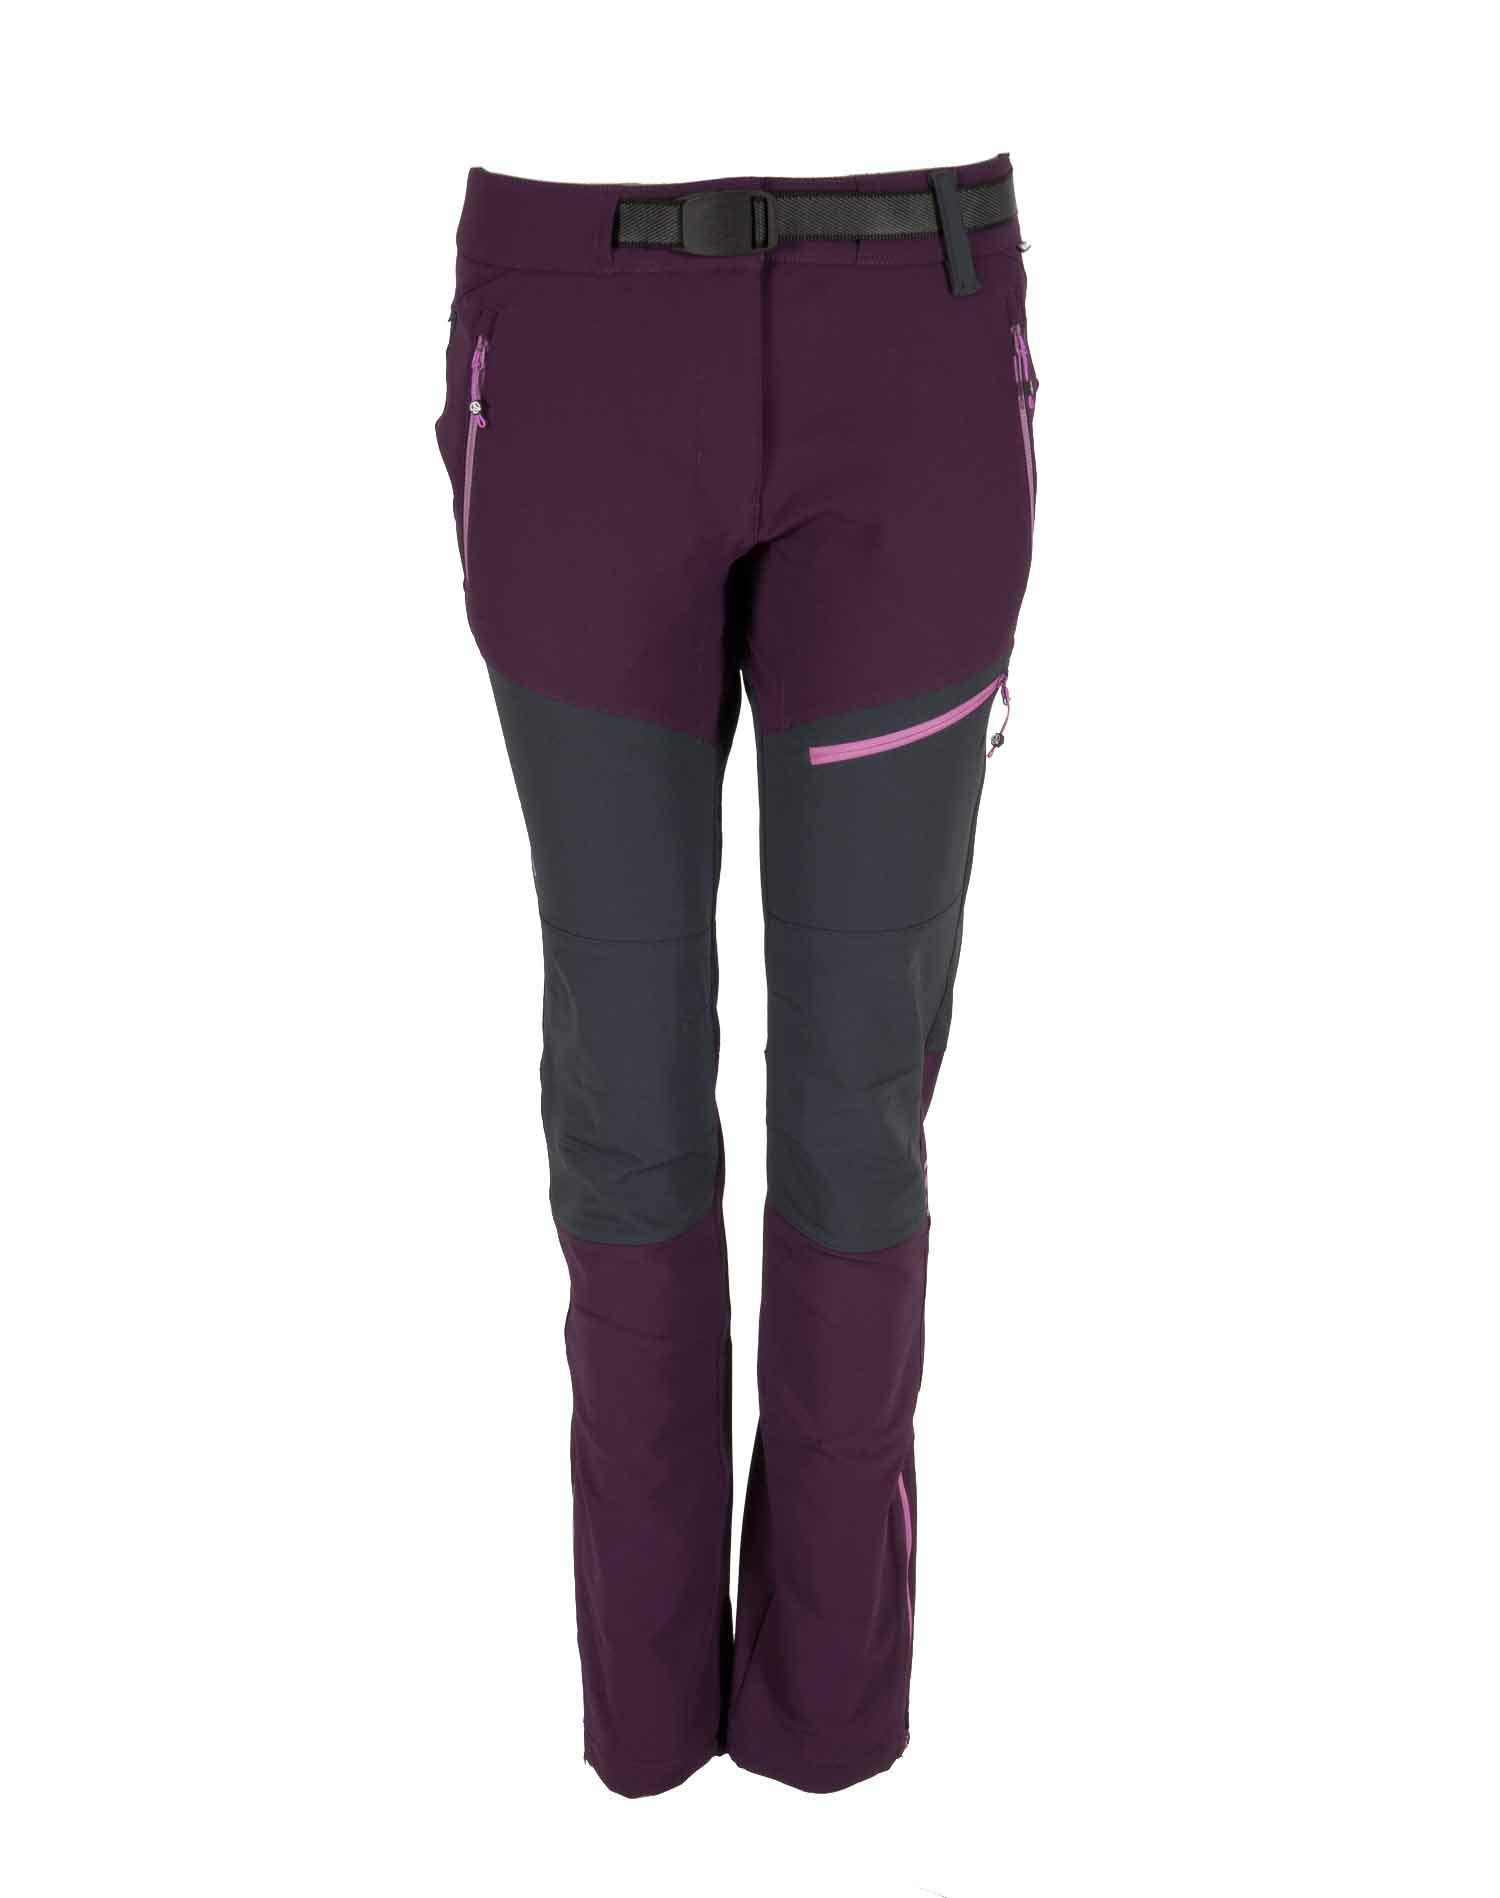 Ternua 女式 Bihar 裤子 W,女式,12735652351